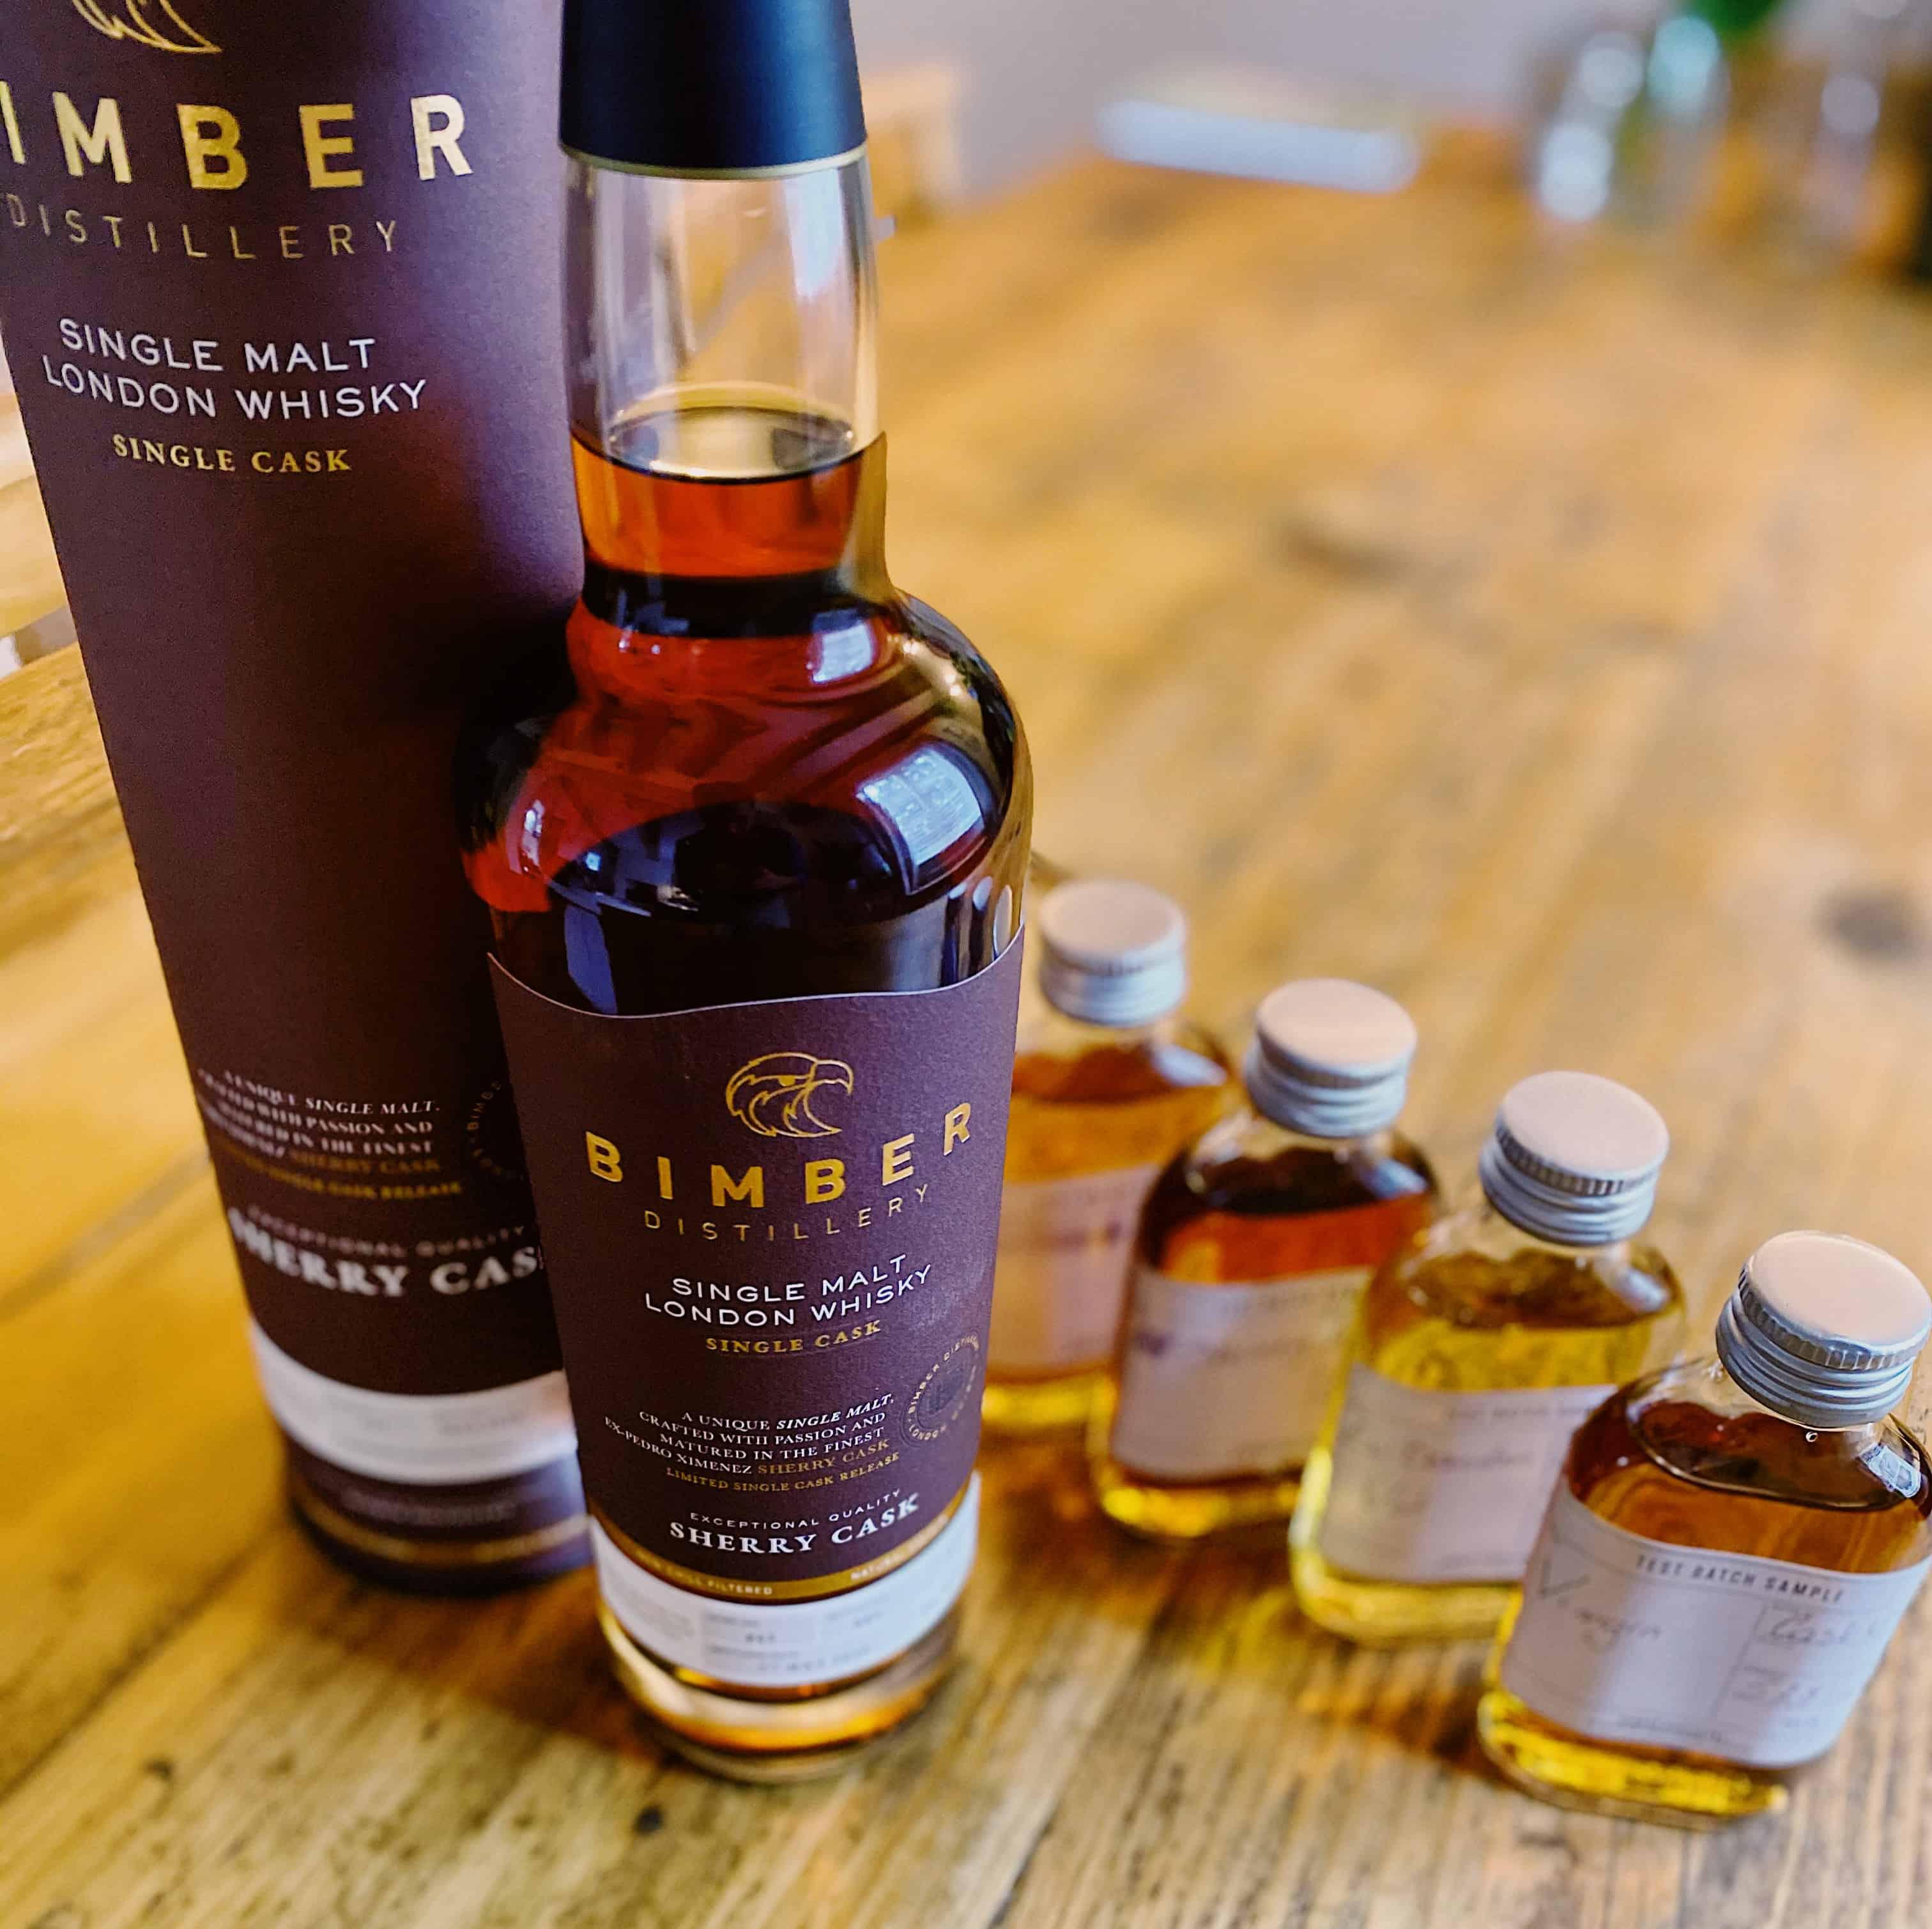 Bimber whisky